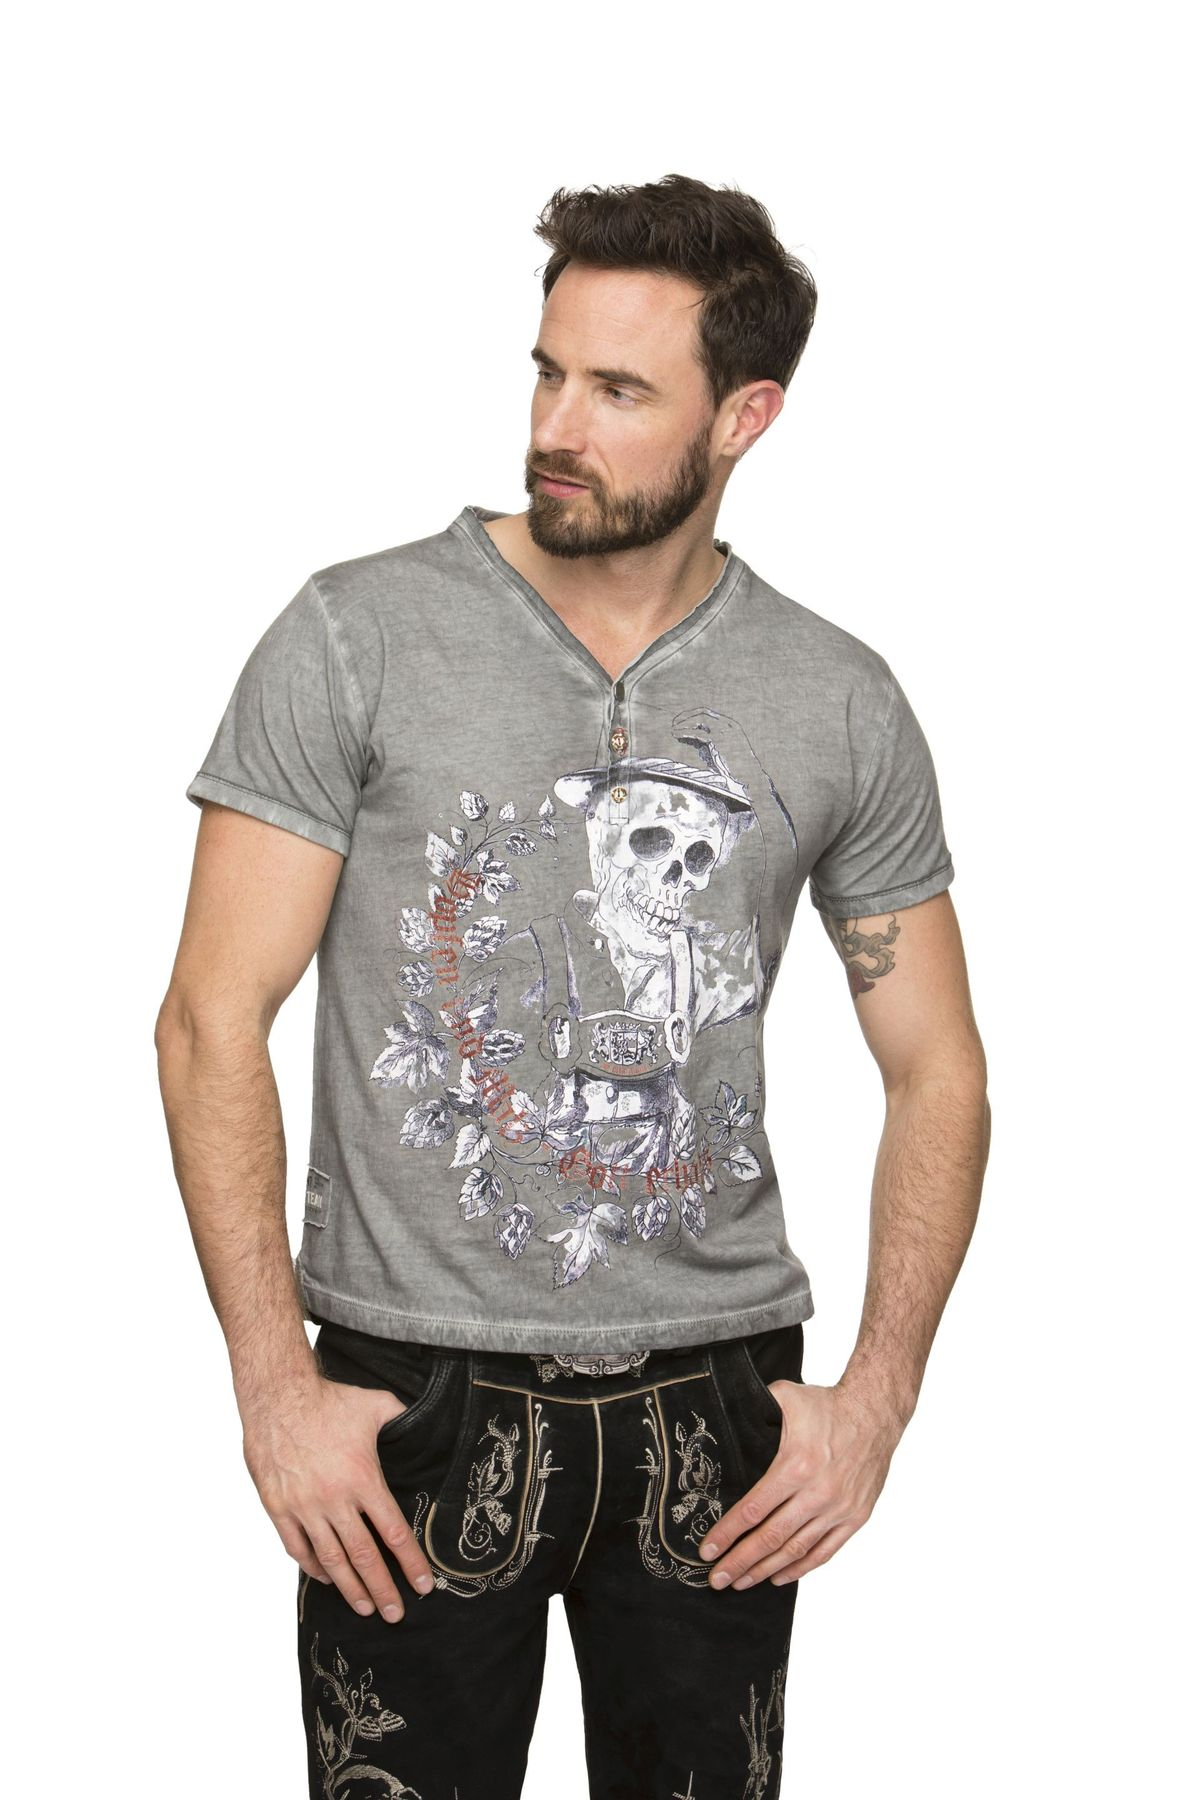 Stockerpoint - Herren Trachten T-Shirt, Oskar – Bild 6